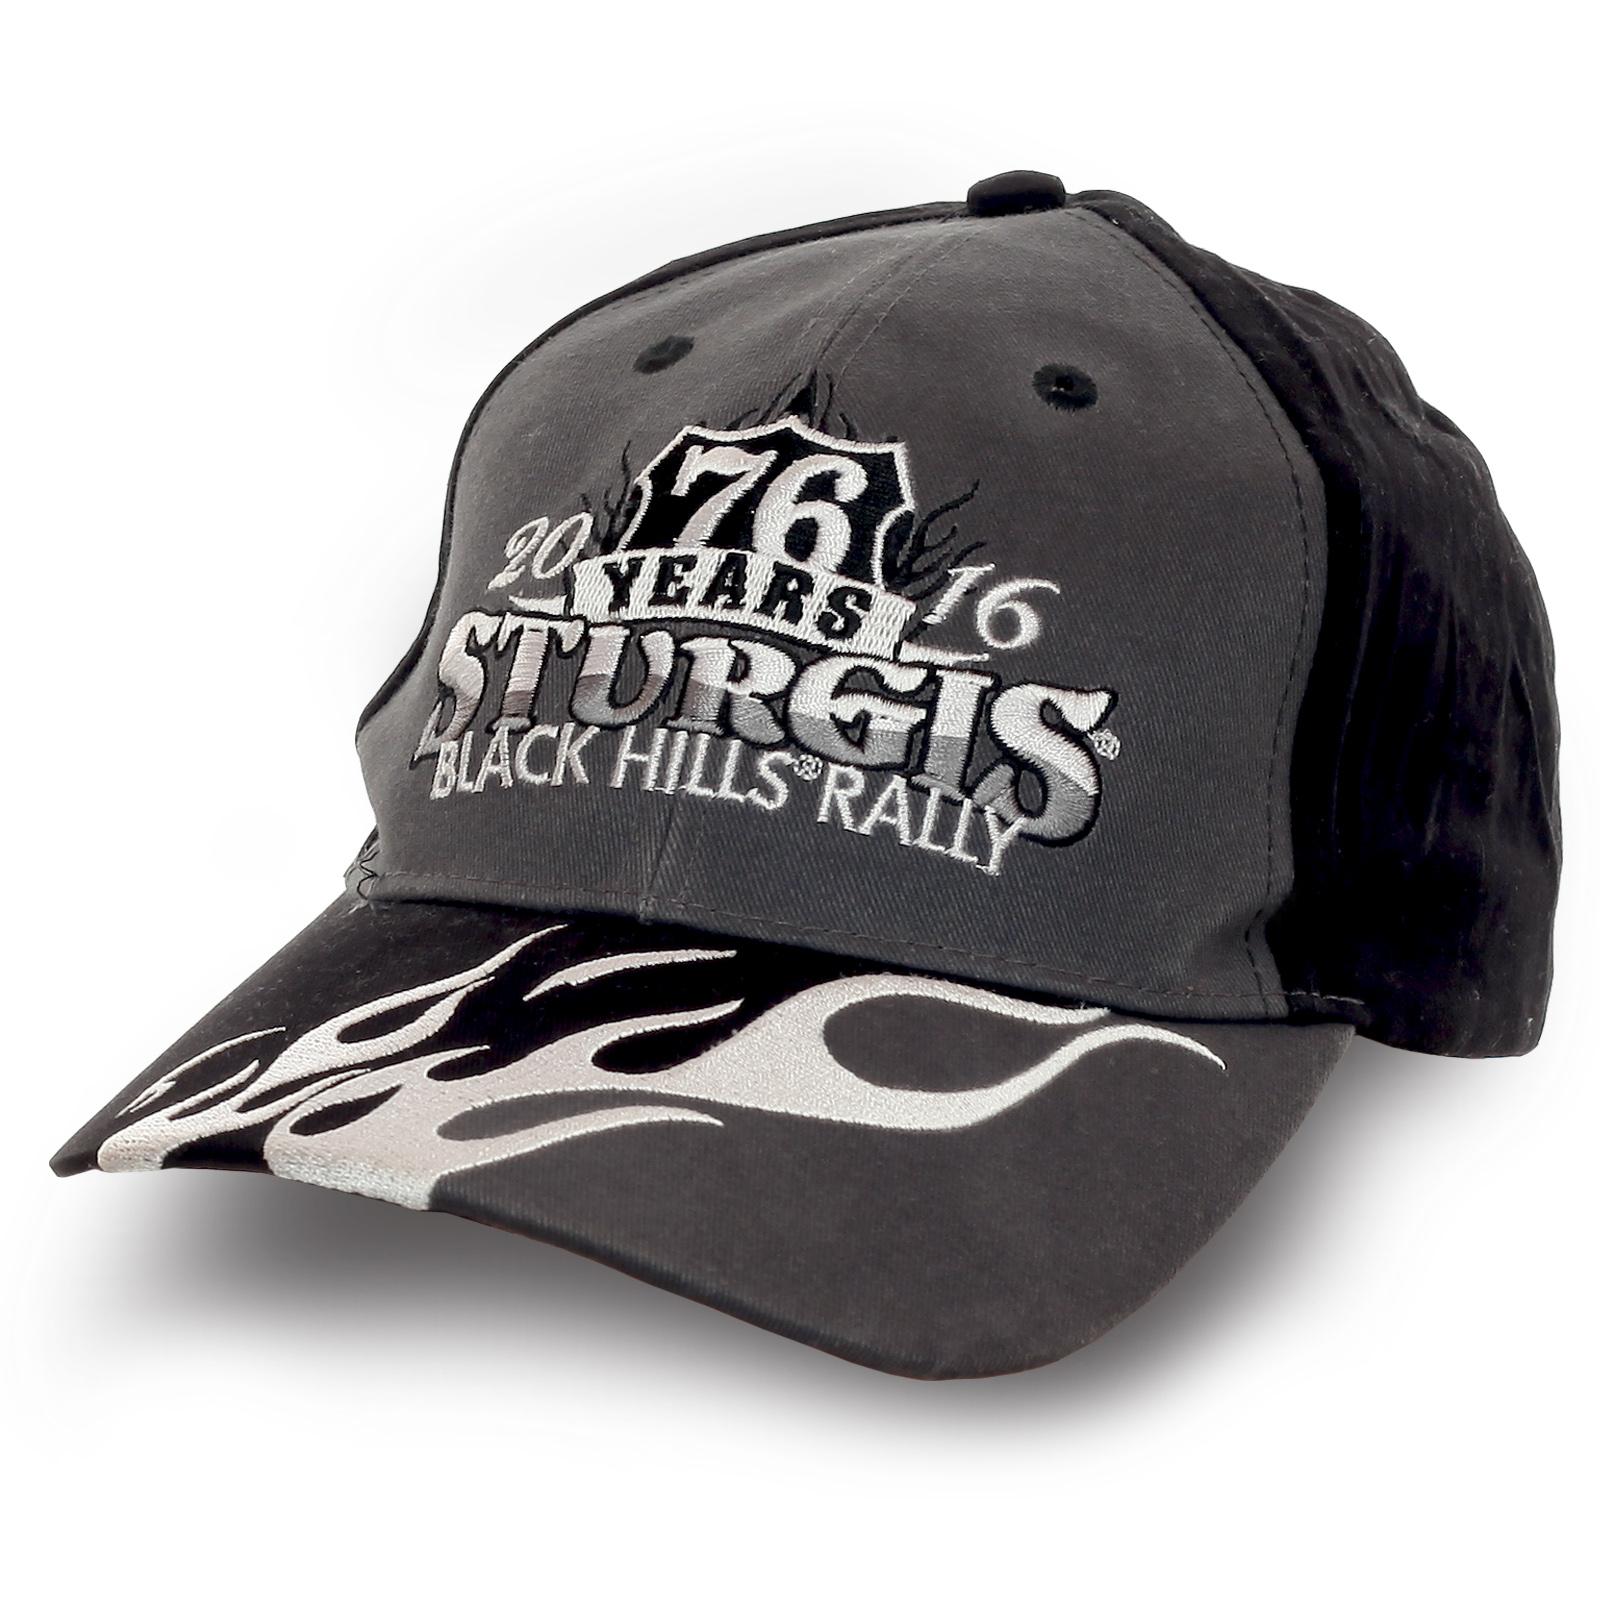 Бейсболка Black Hills Rally от Sturgis